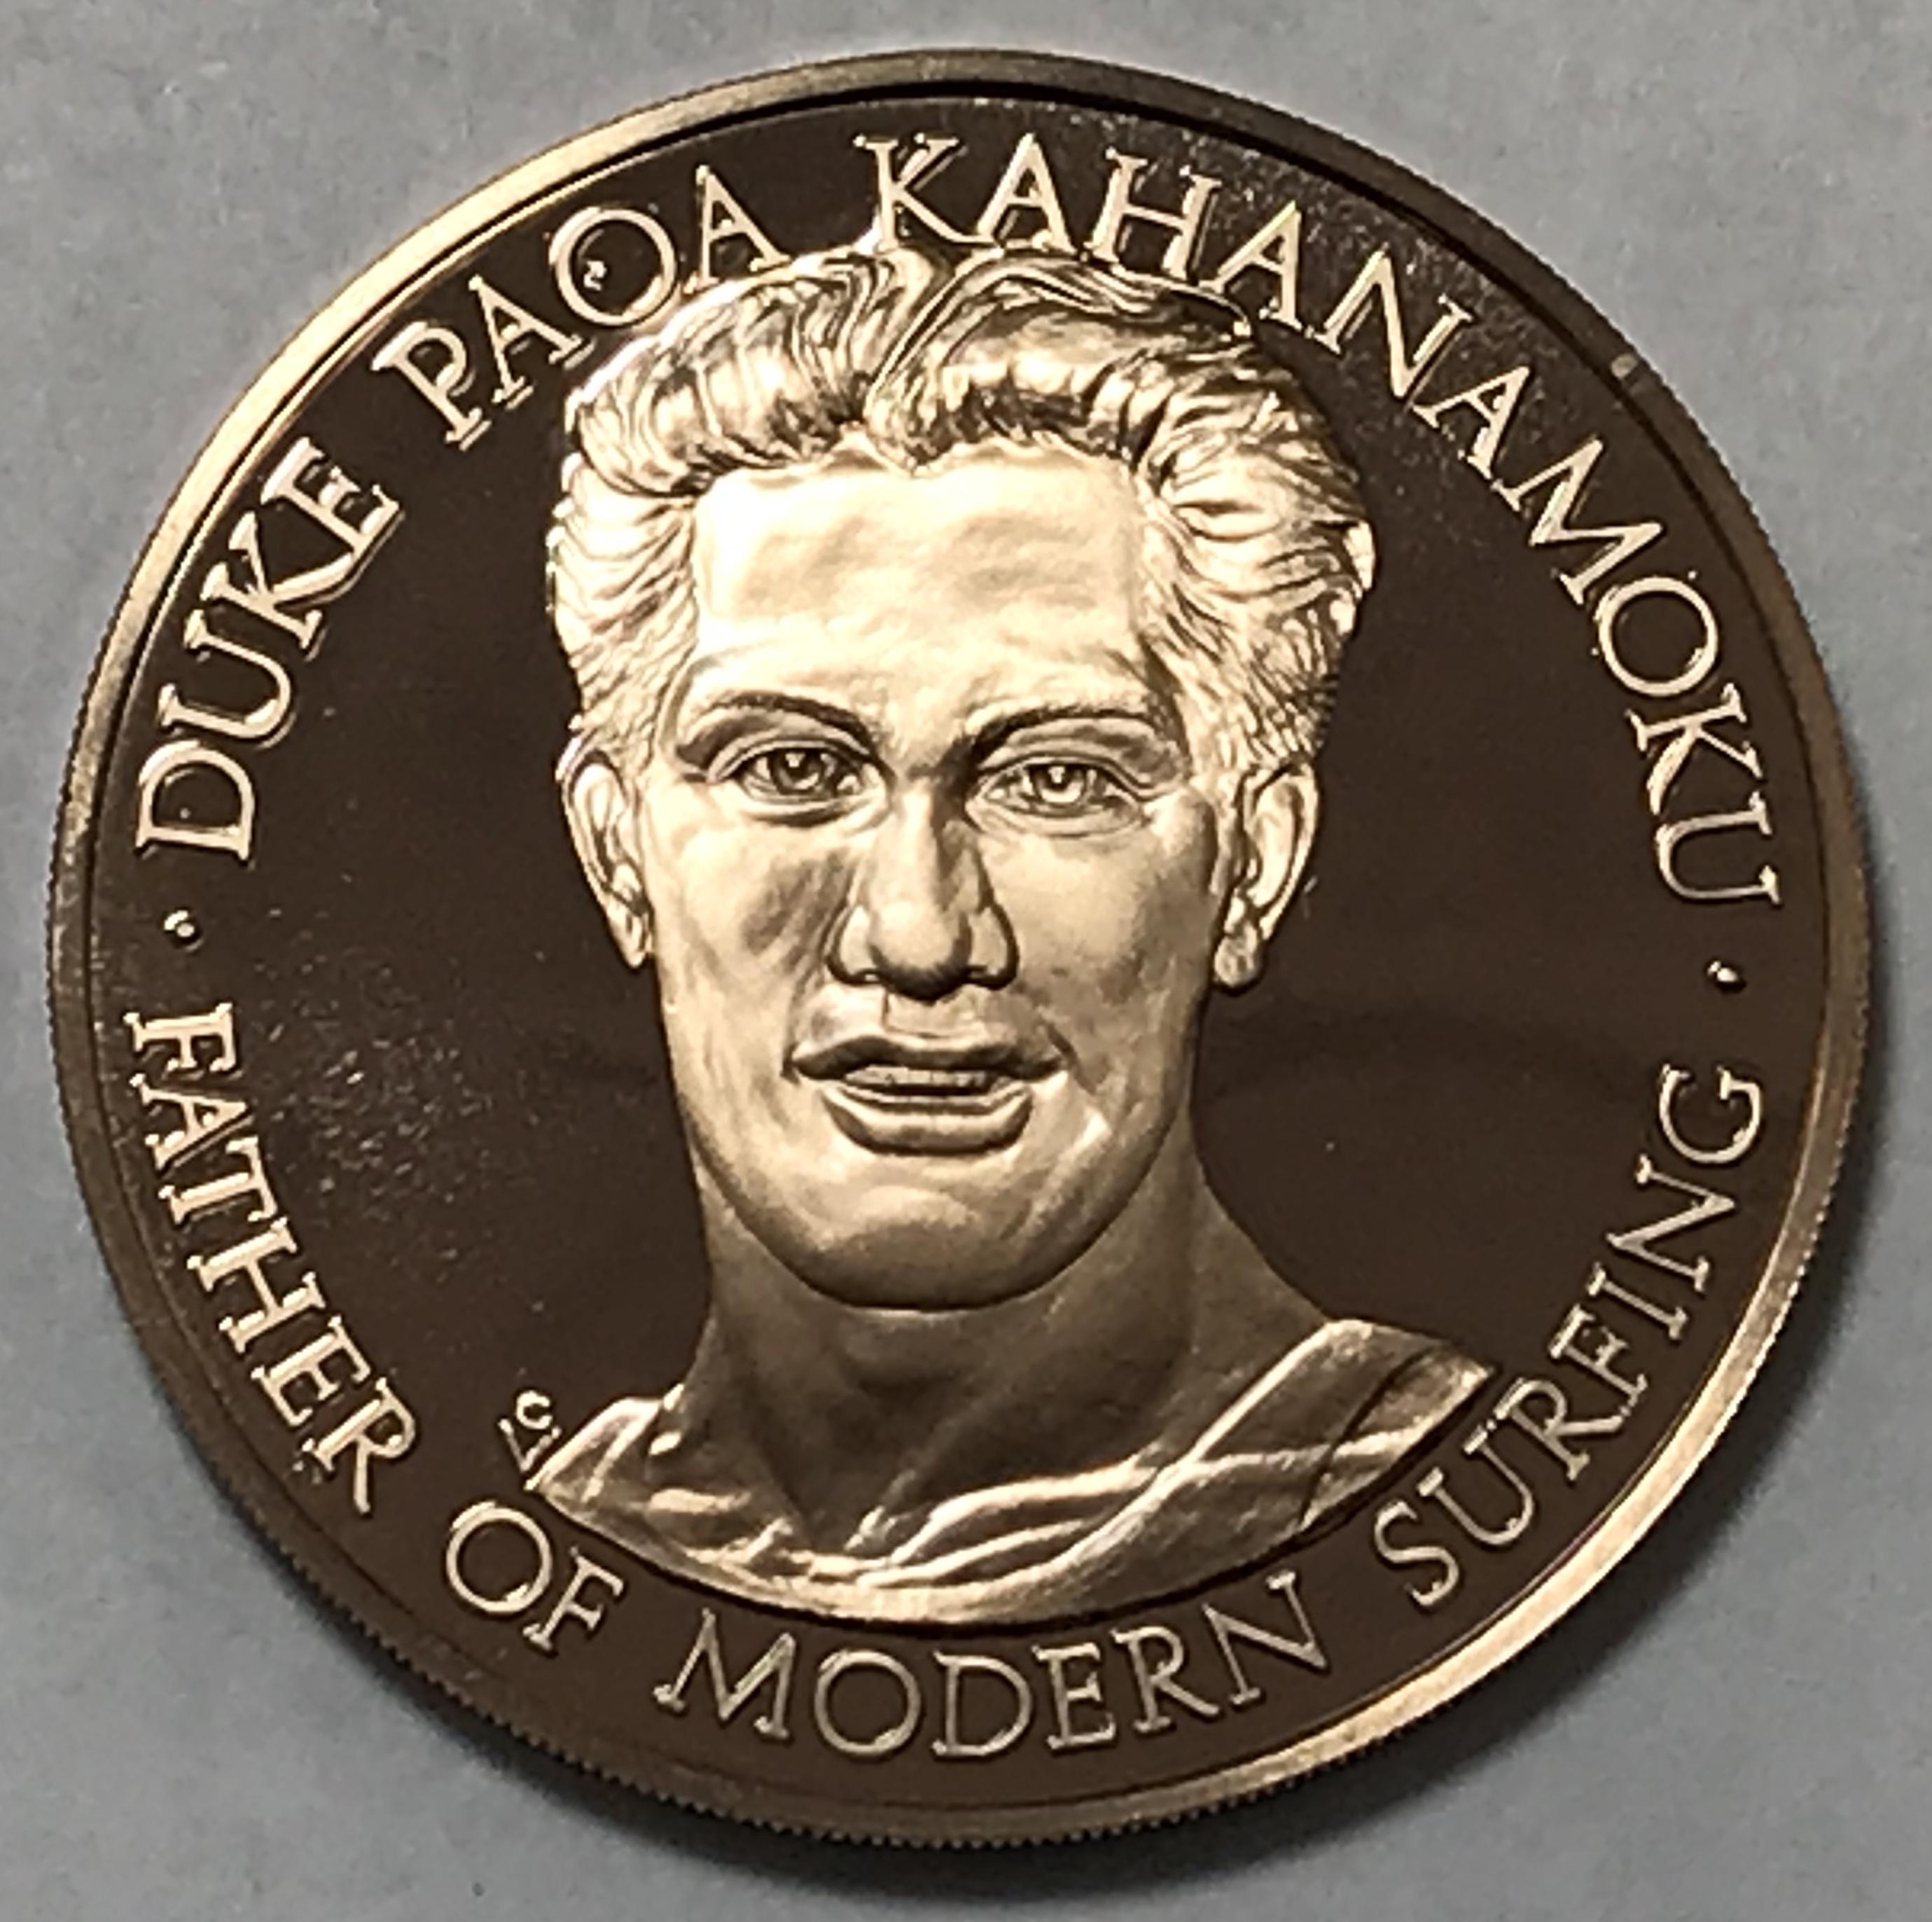 1976 Duke Paoa Kahanamoku American Surfing Association Proof Commemorative Coin Medal Property Room